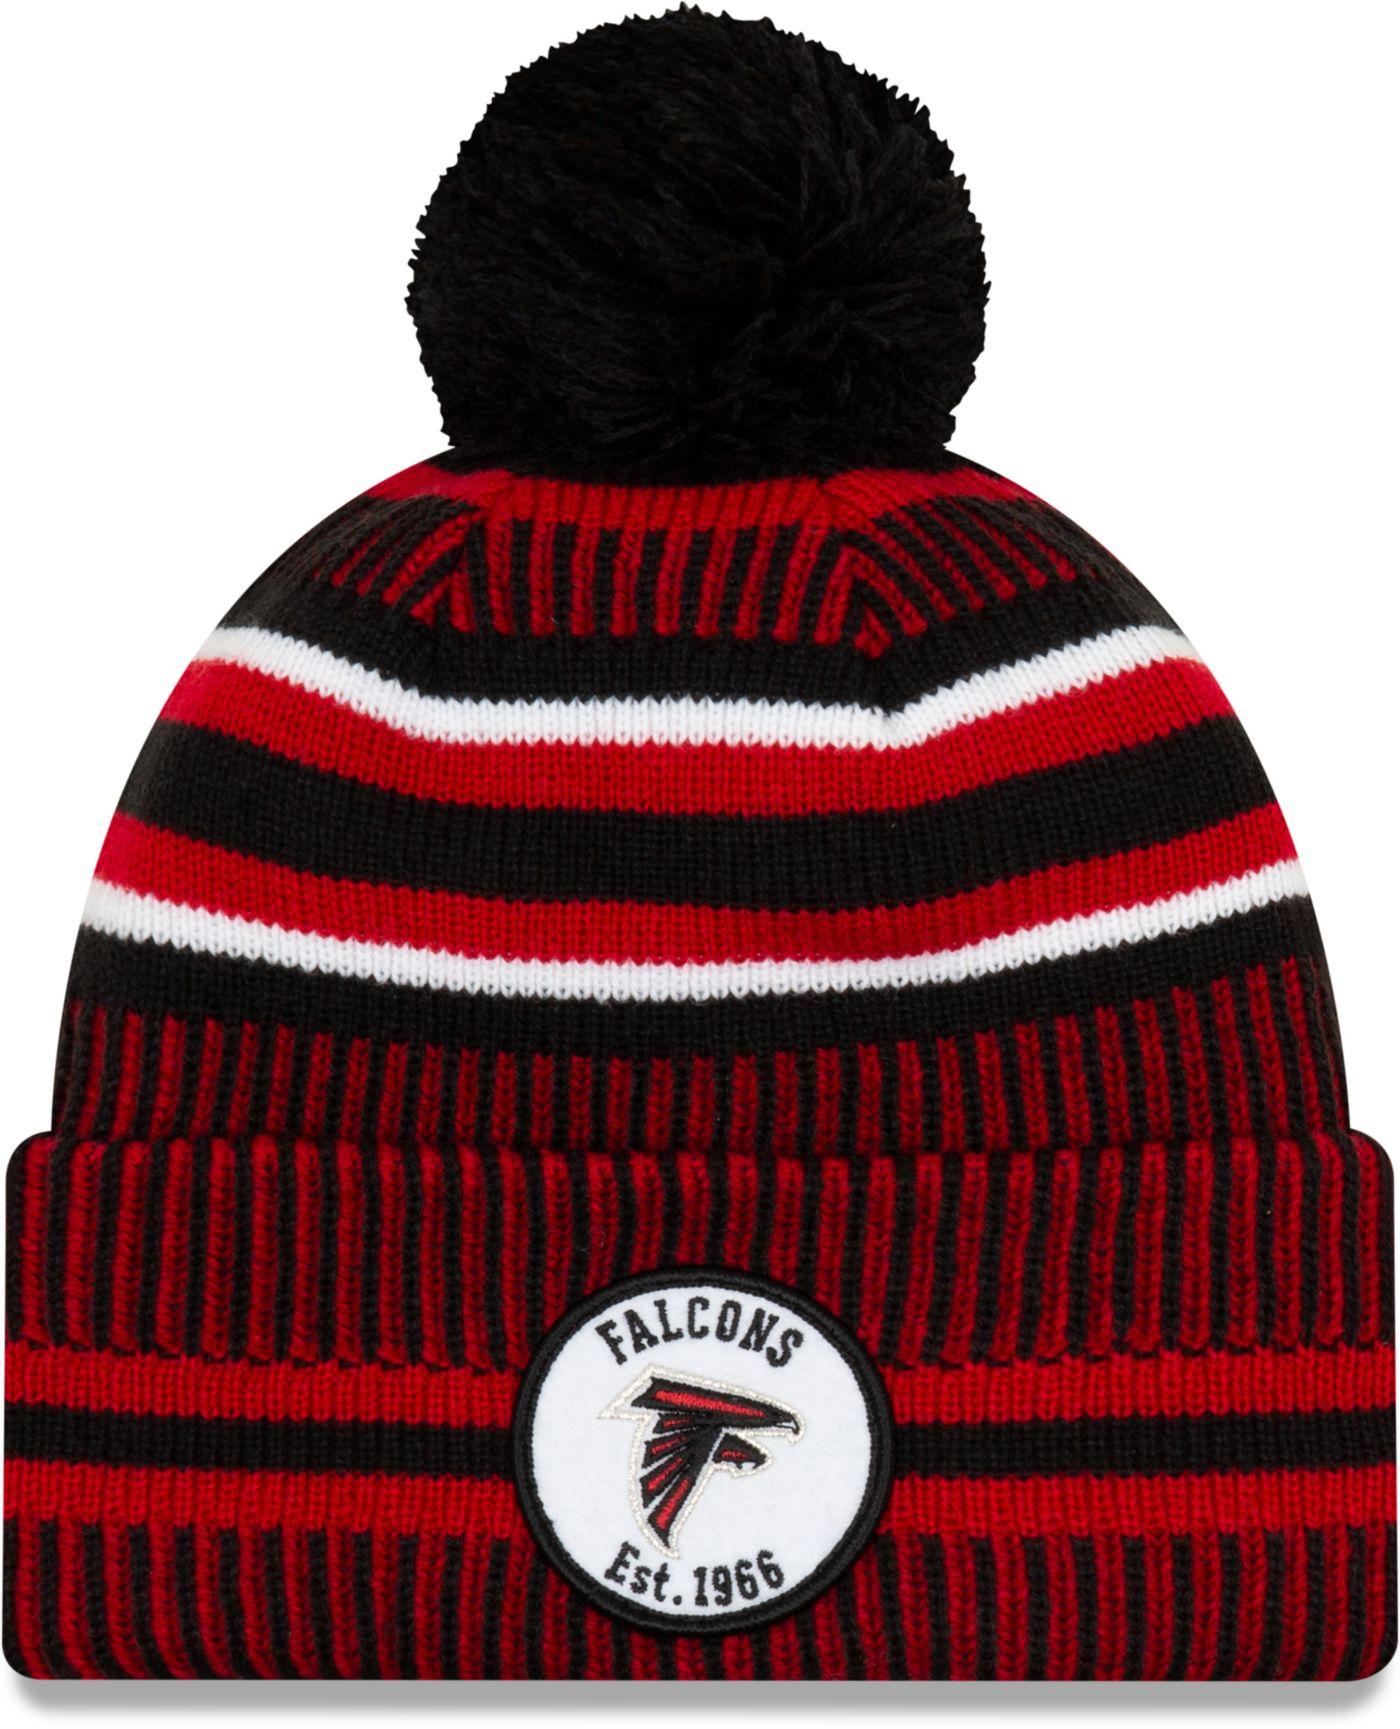 New Era Men's Atlanta Falcons Sideline Home Sport Pom Knit